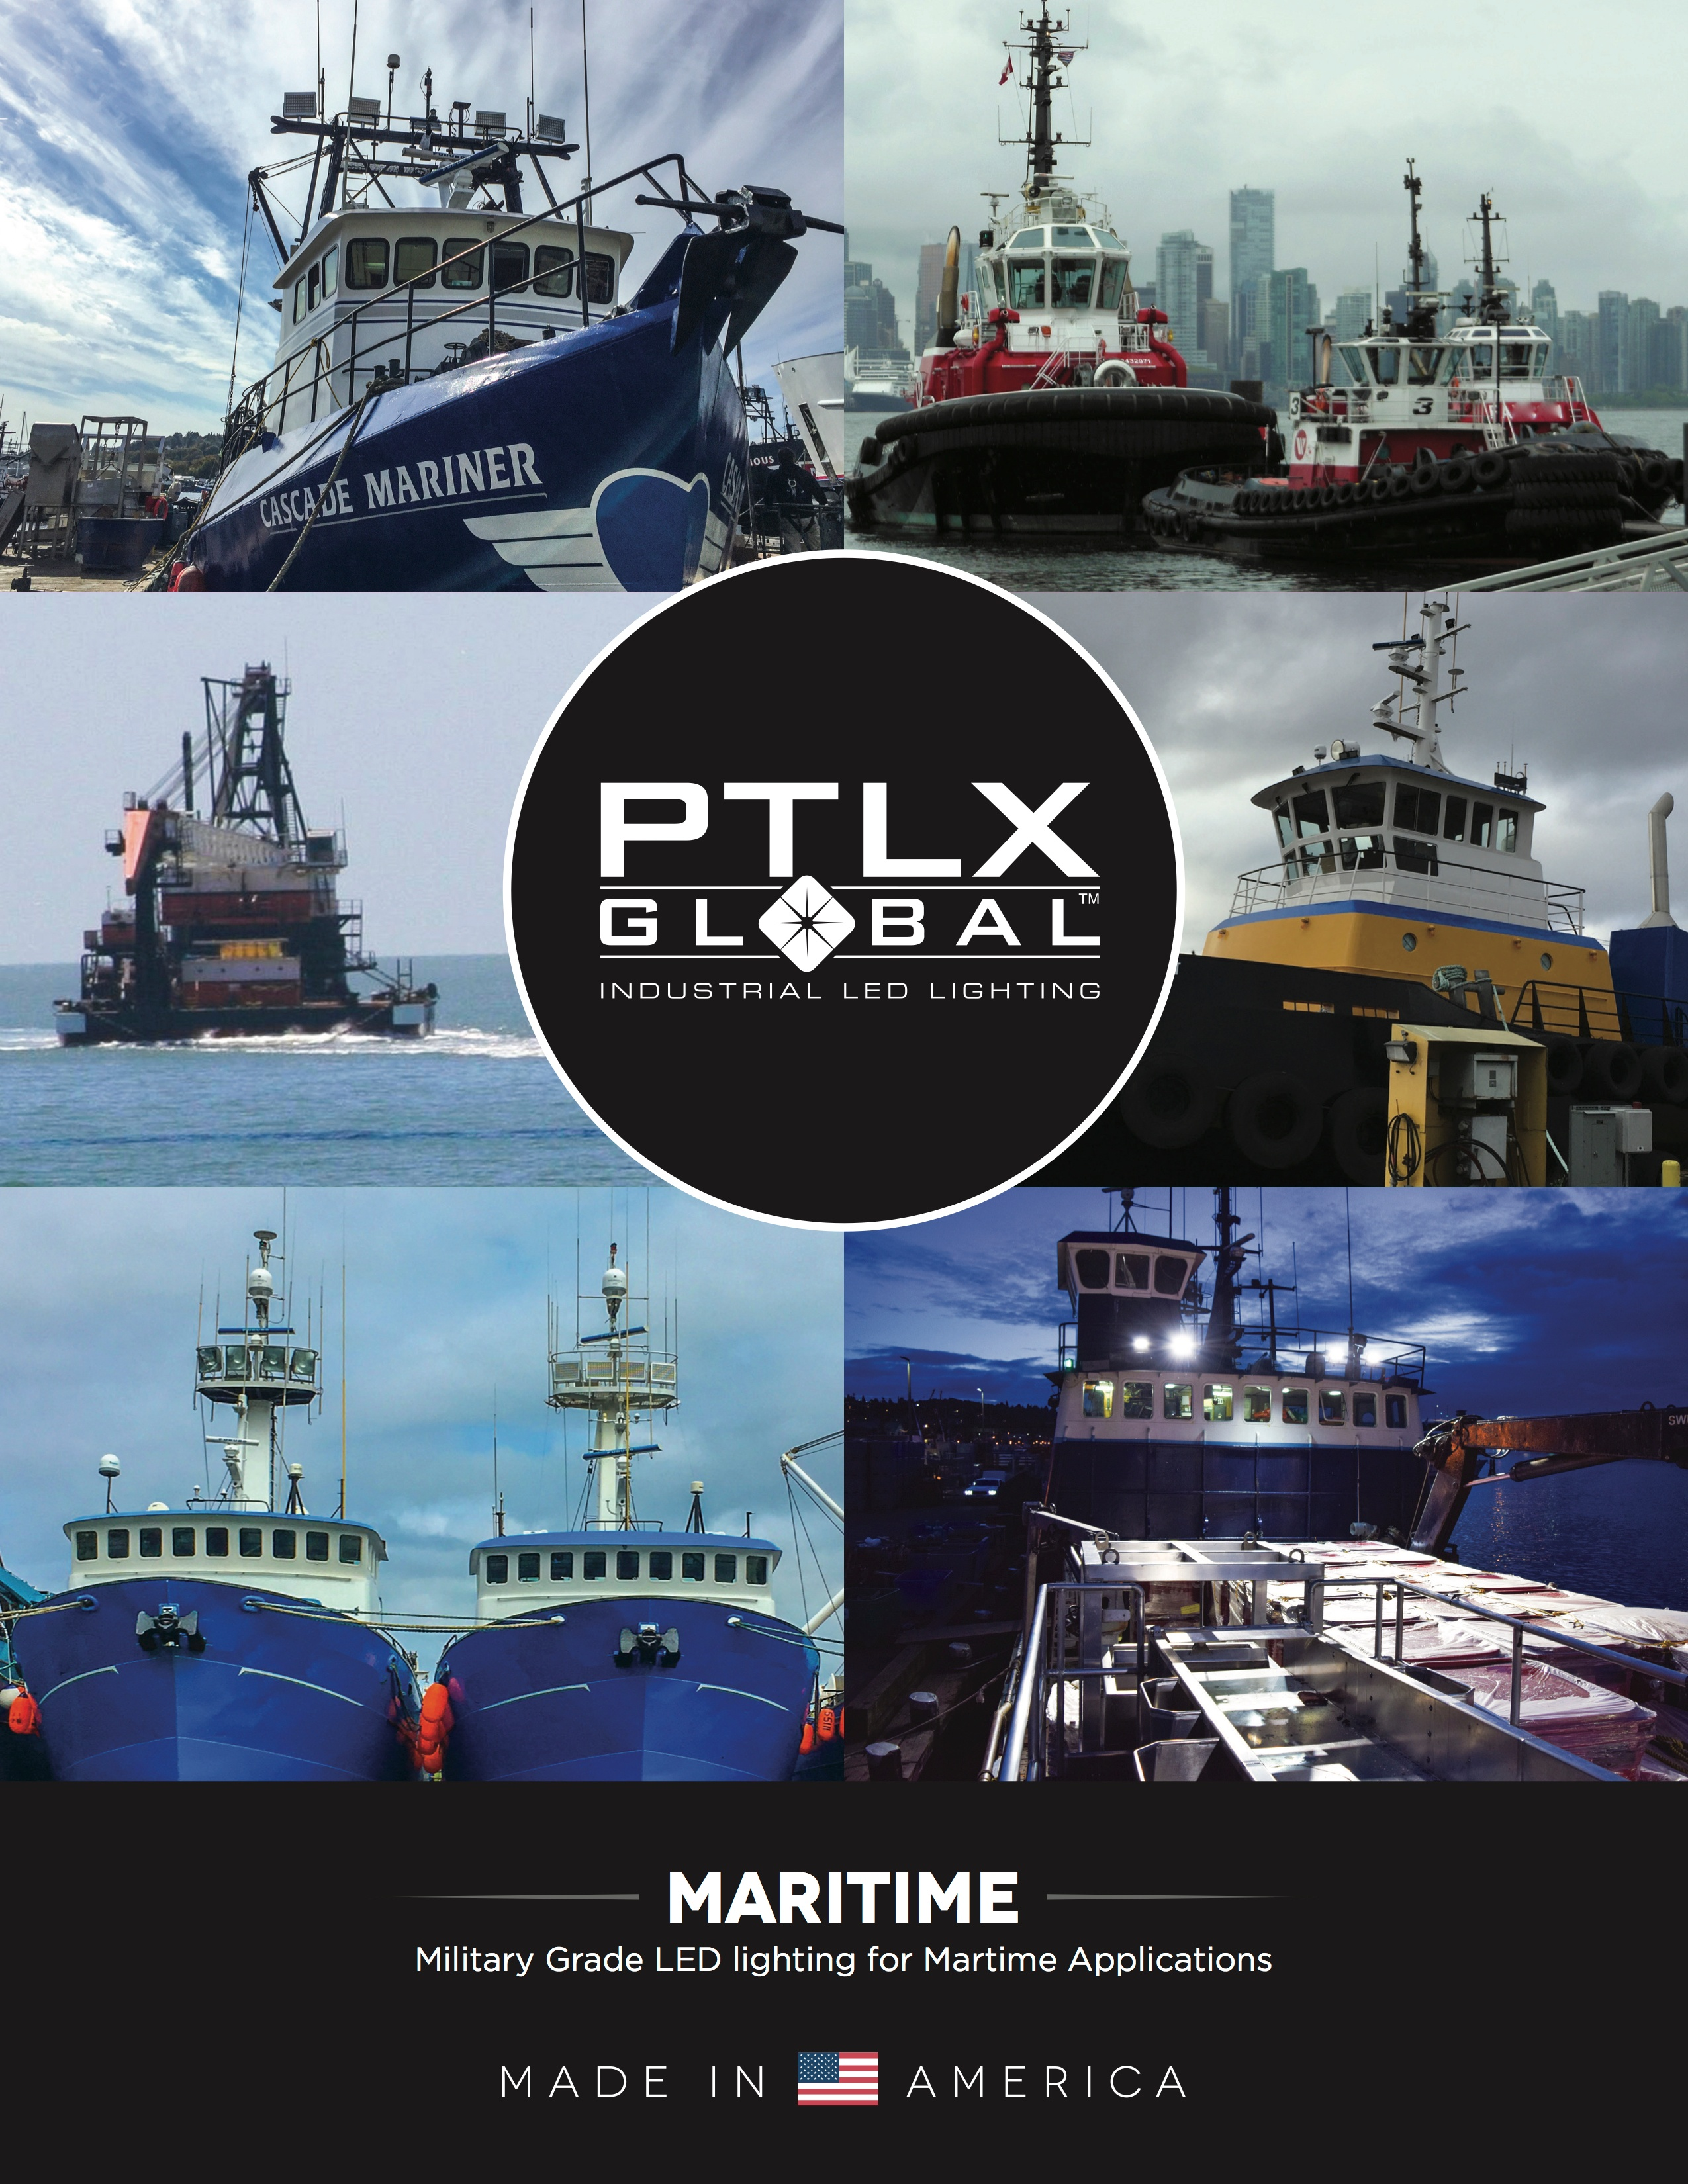 PTLX Marine Brochure 2017 Cover